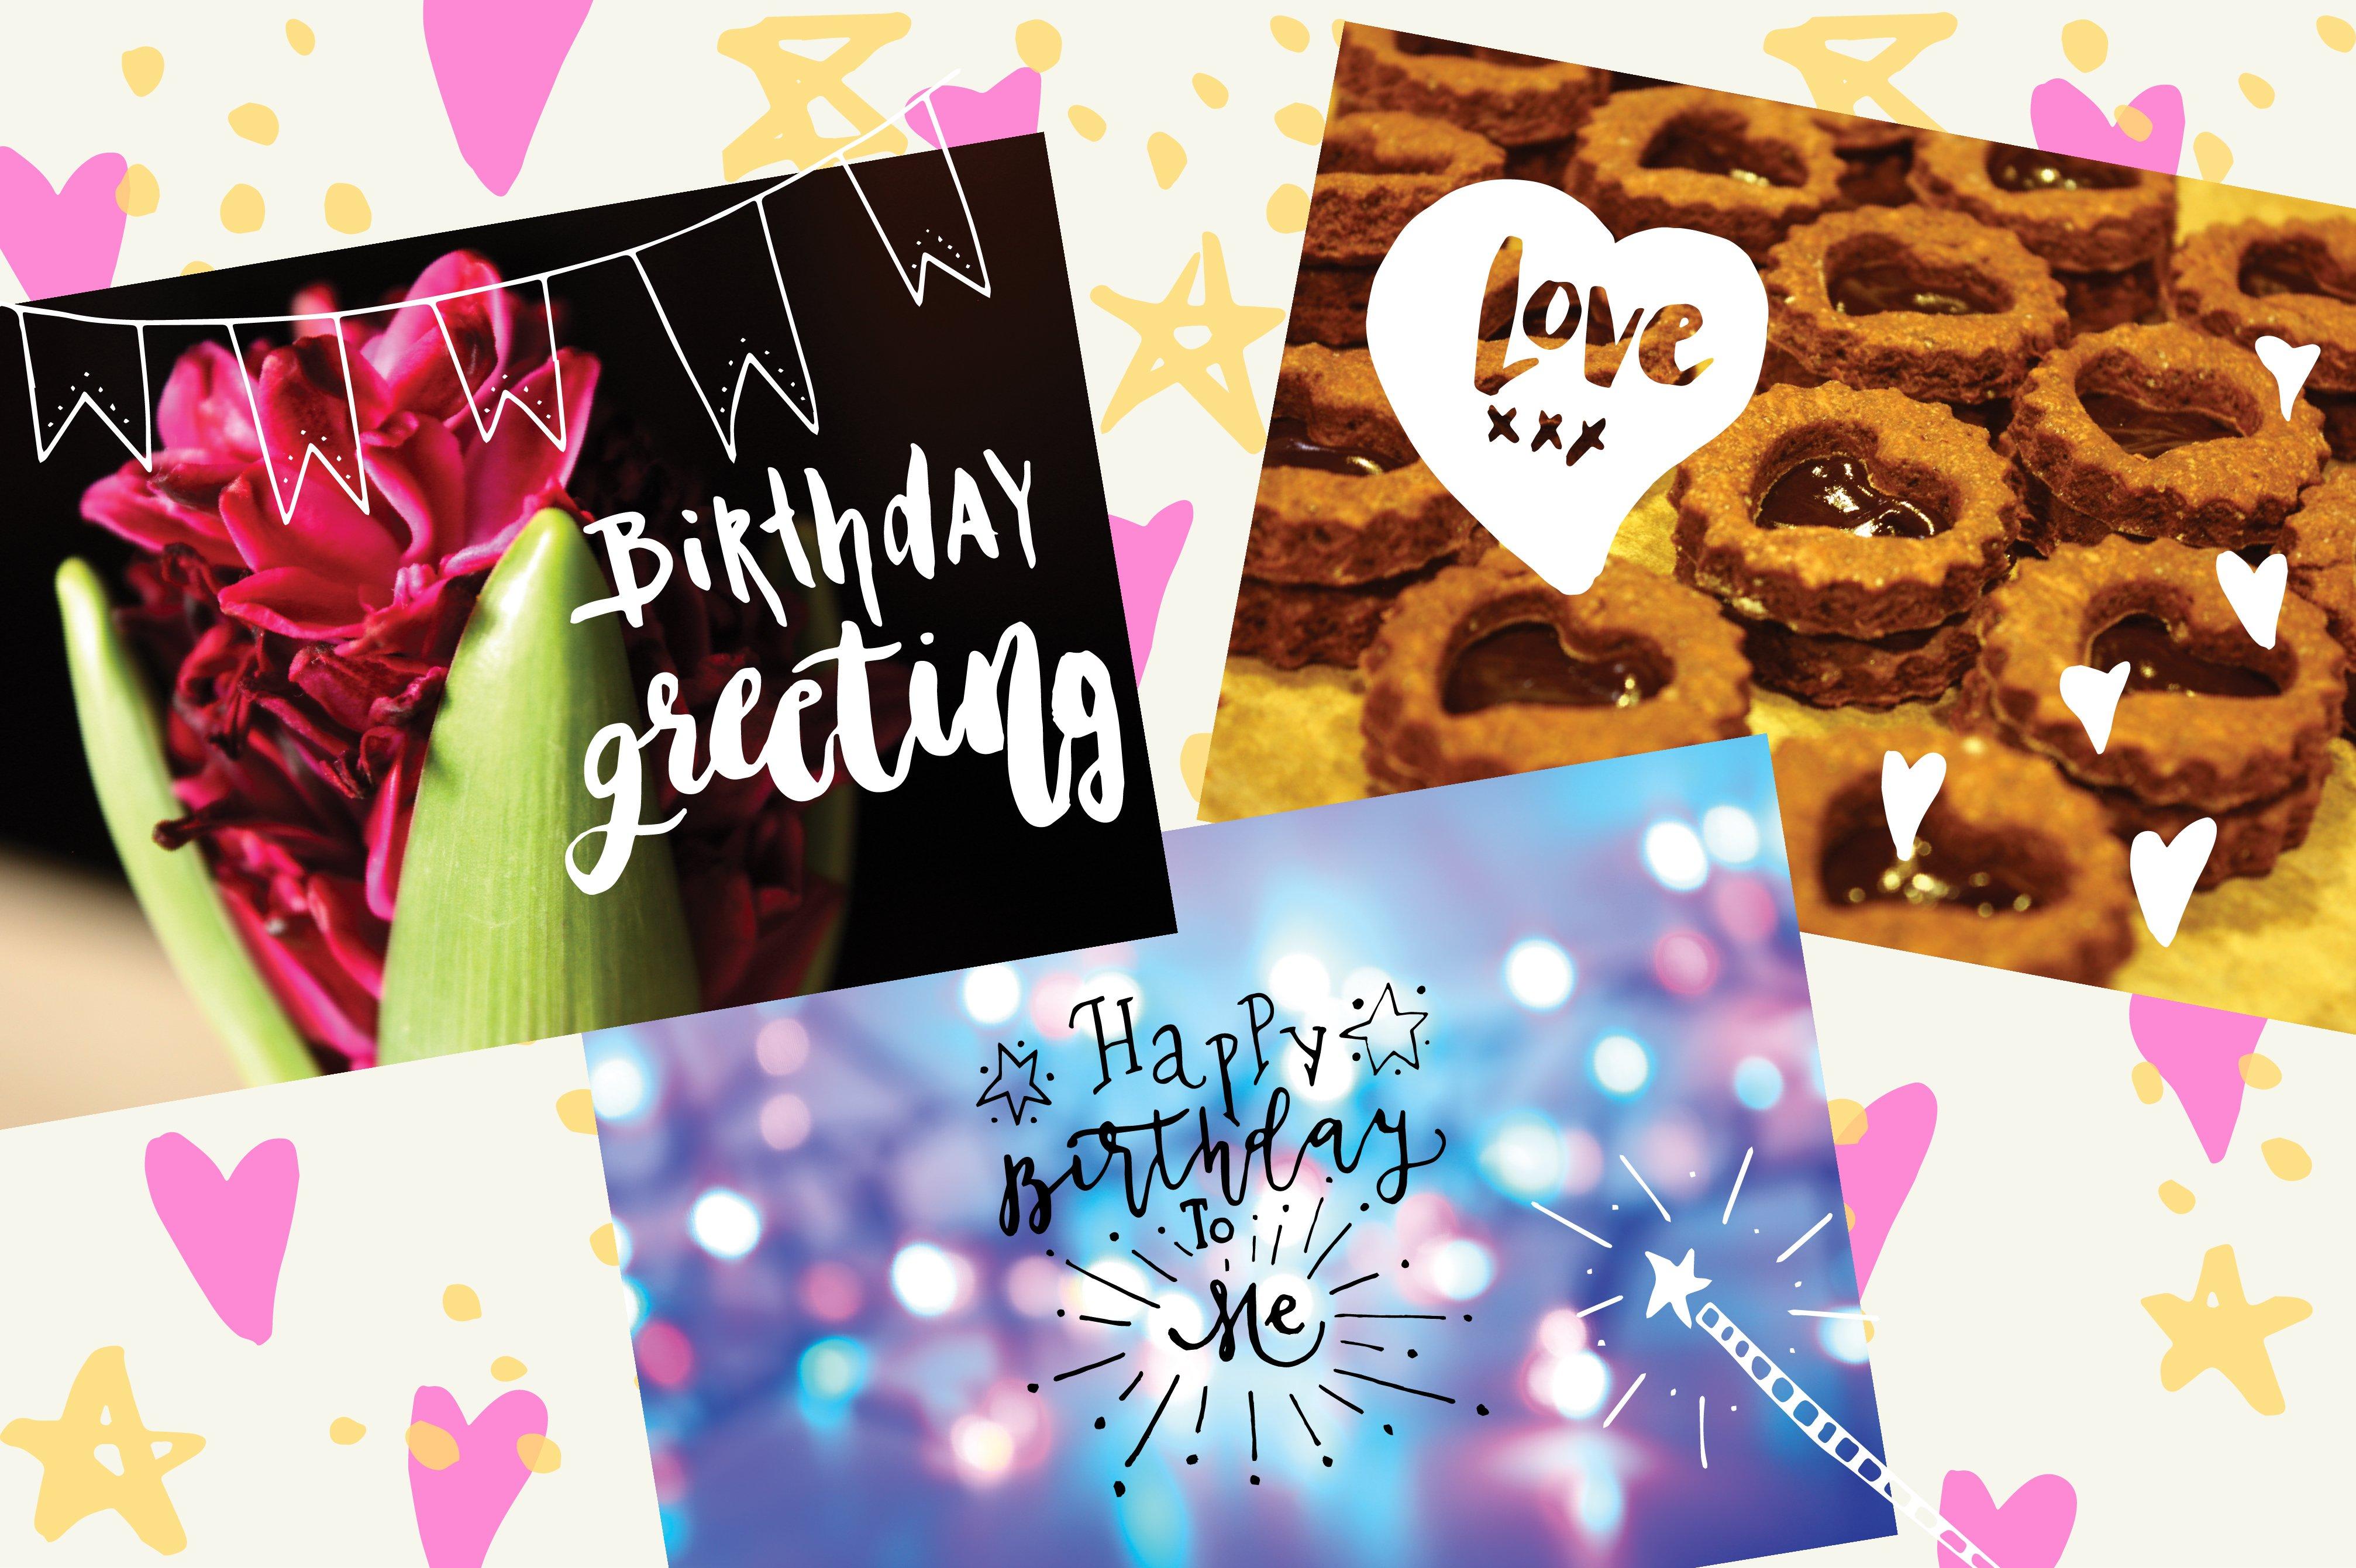 Happy Birthday Cards Maker